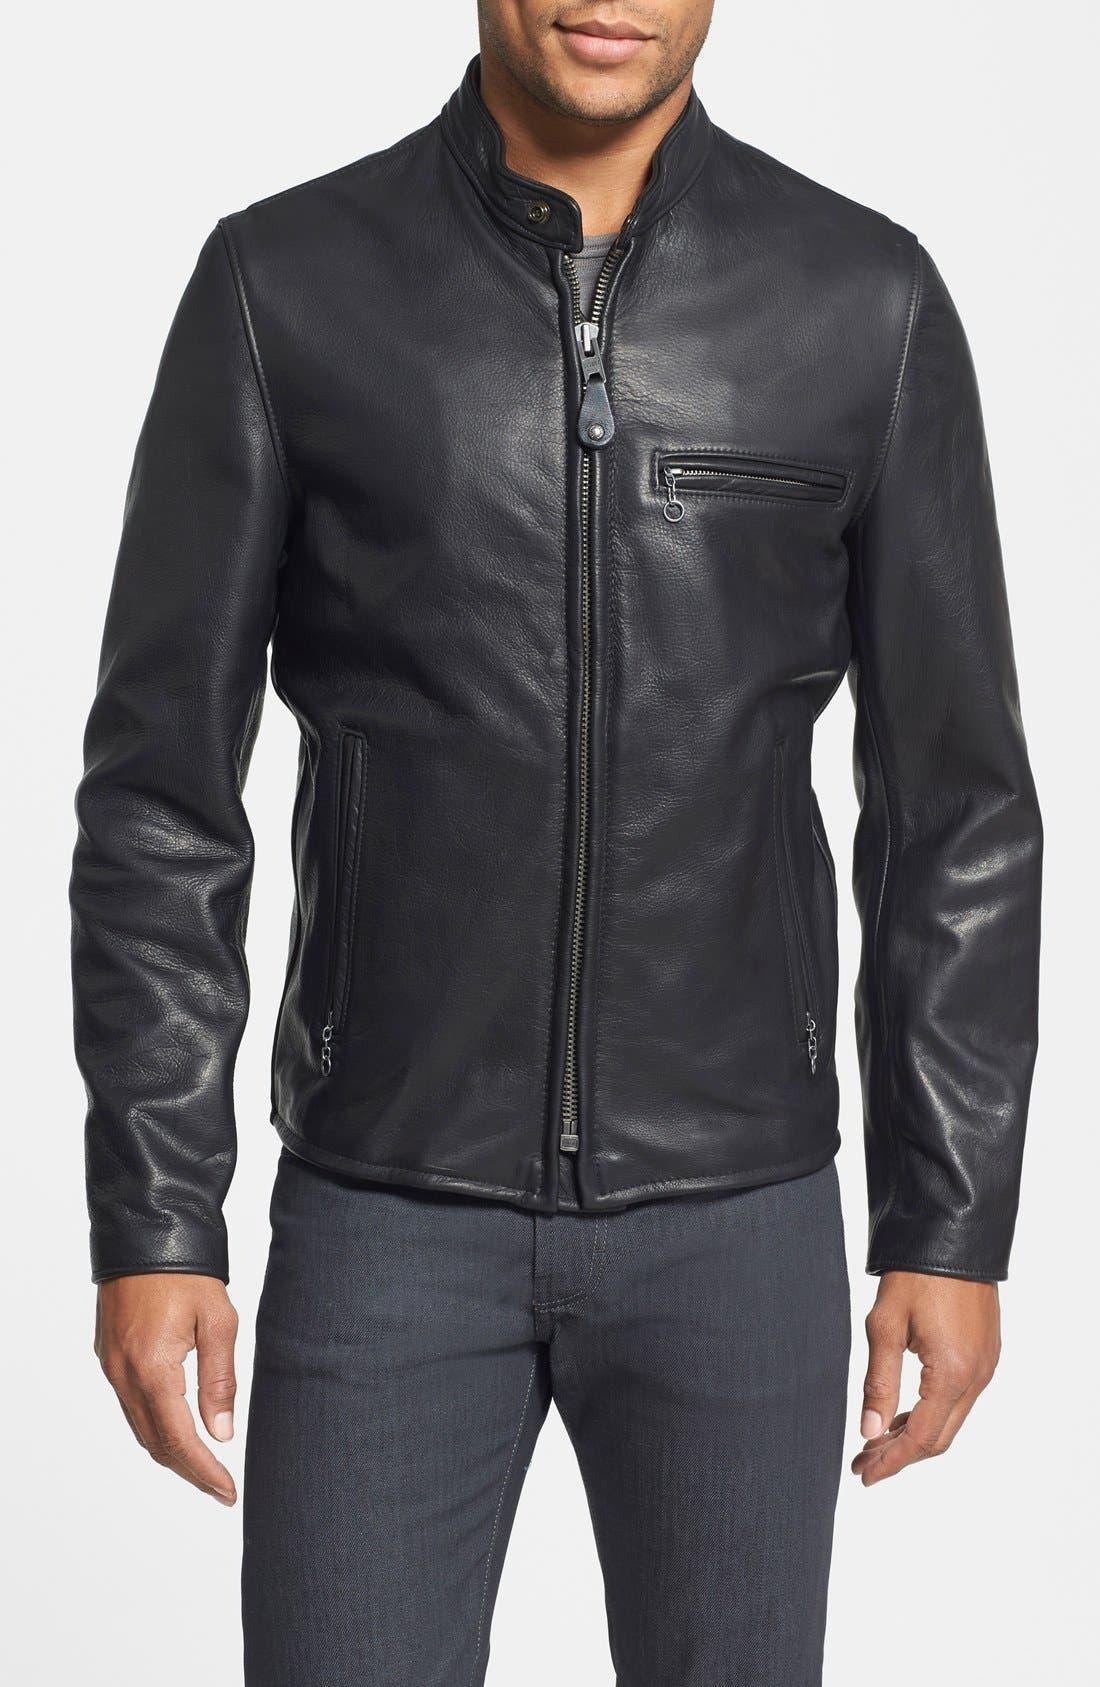 Schott NYC 'Café Racer' Slim Fit Waxy Leather Moto Jacket